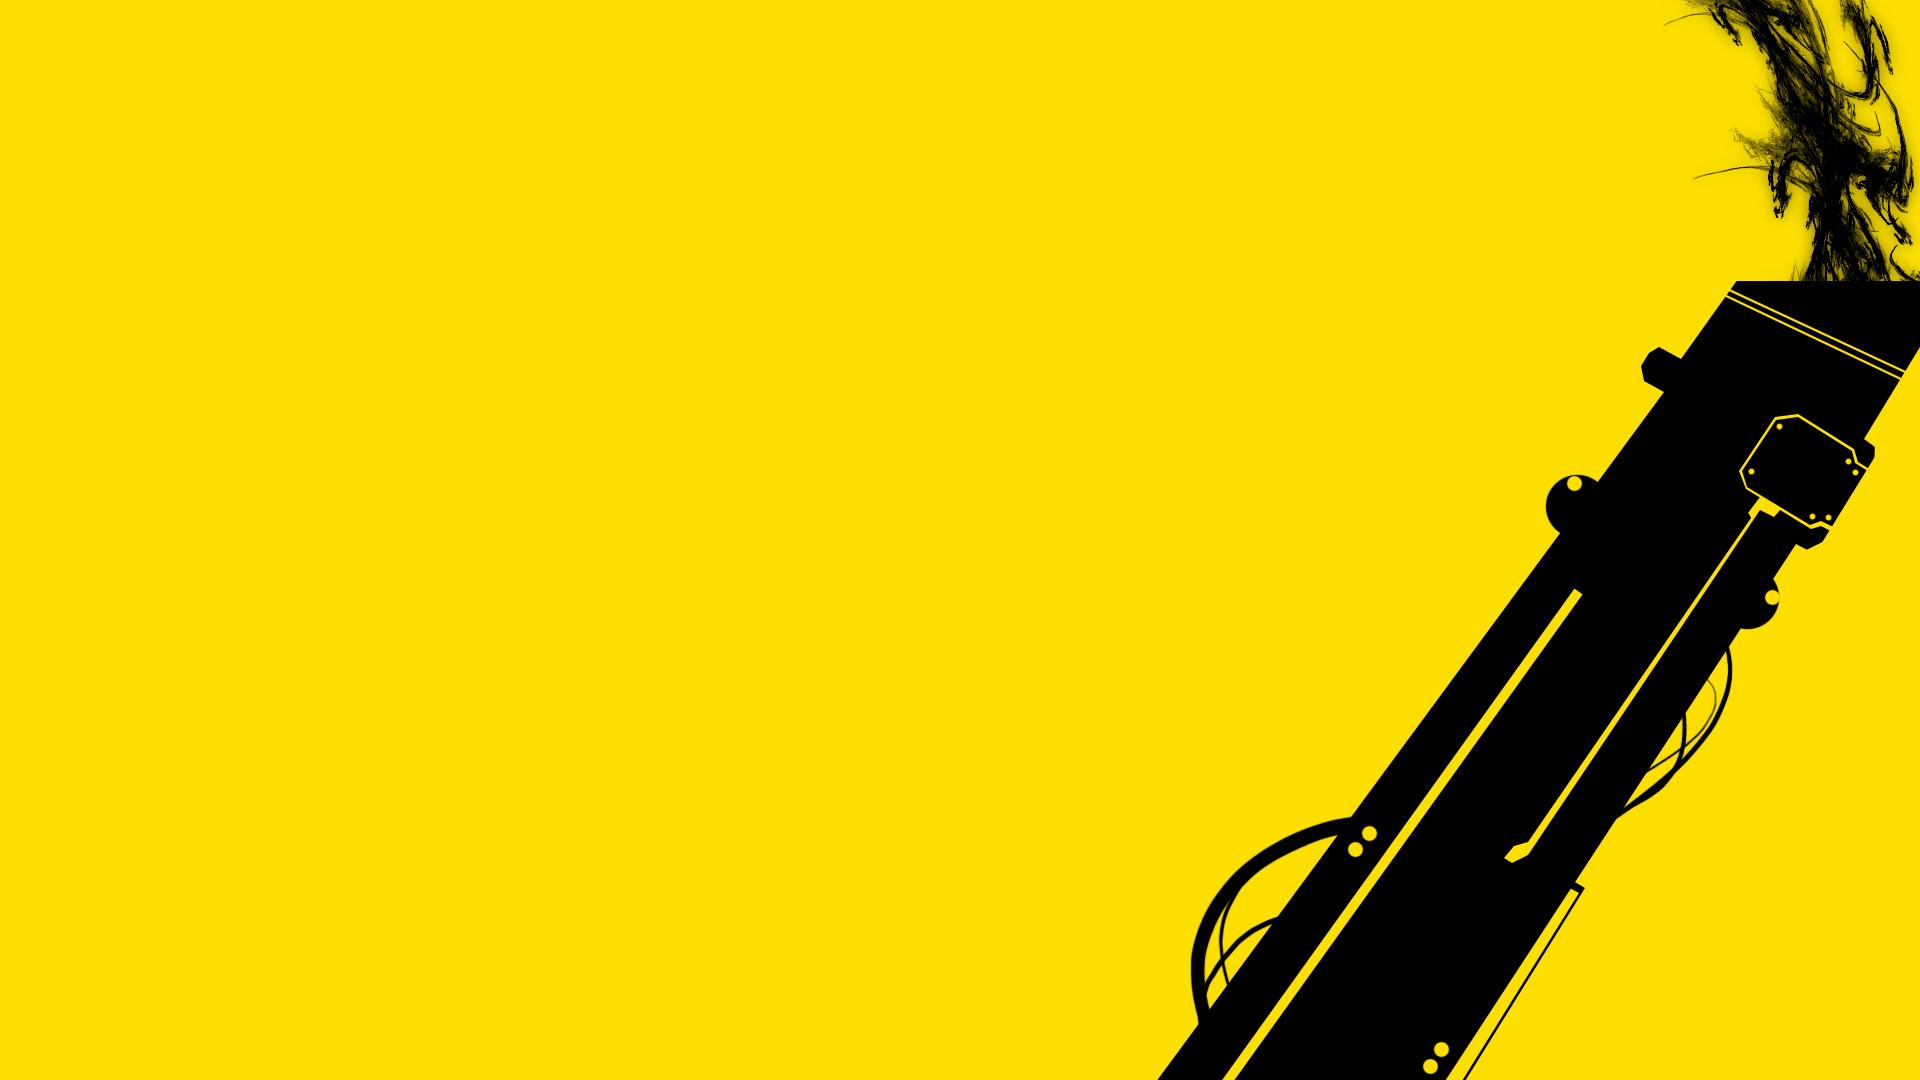 Black And Yellow Wallpaper 20 Cool Wallpaper Hdblackwallpapercom